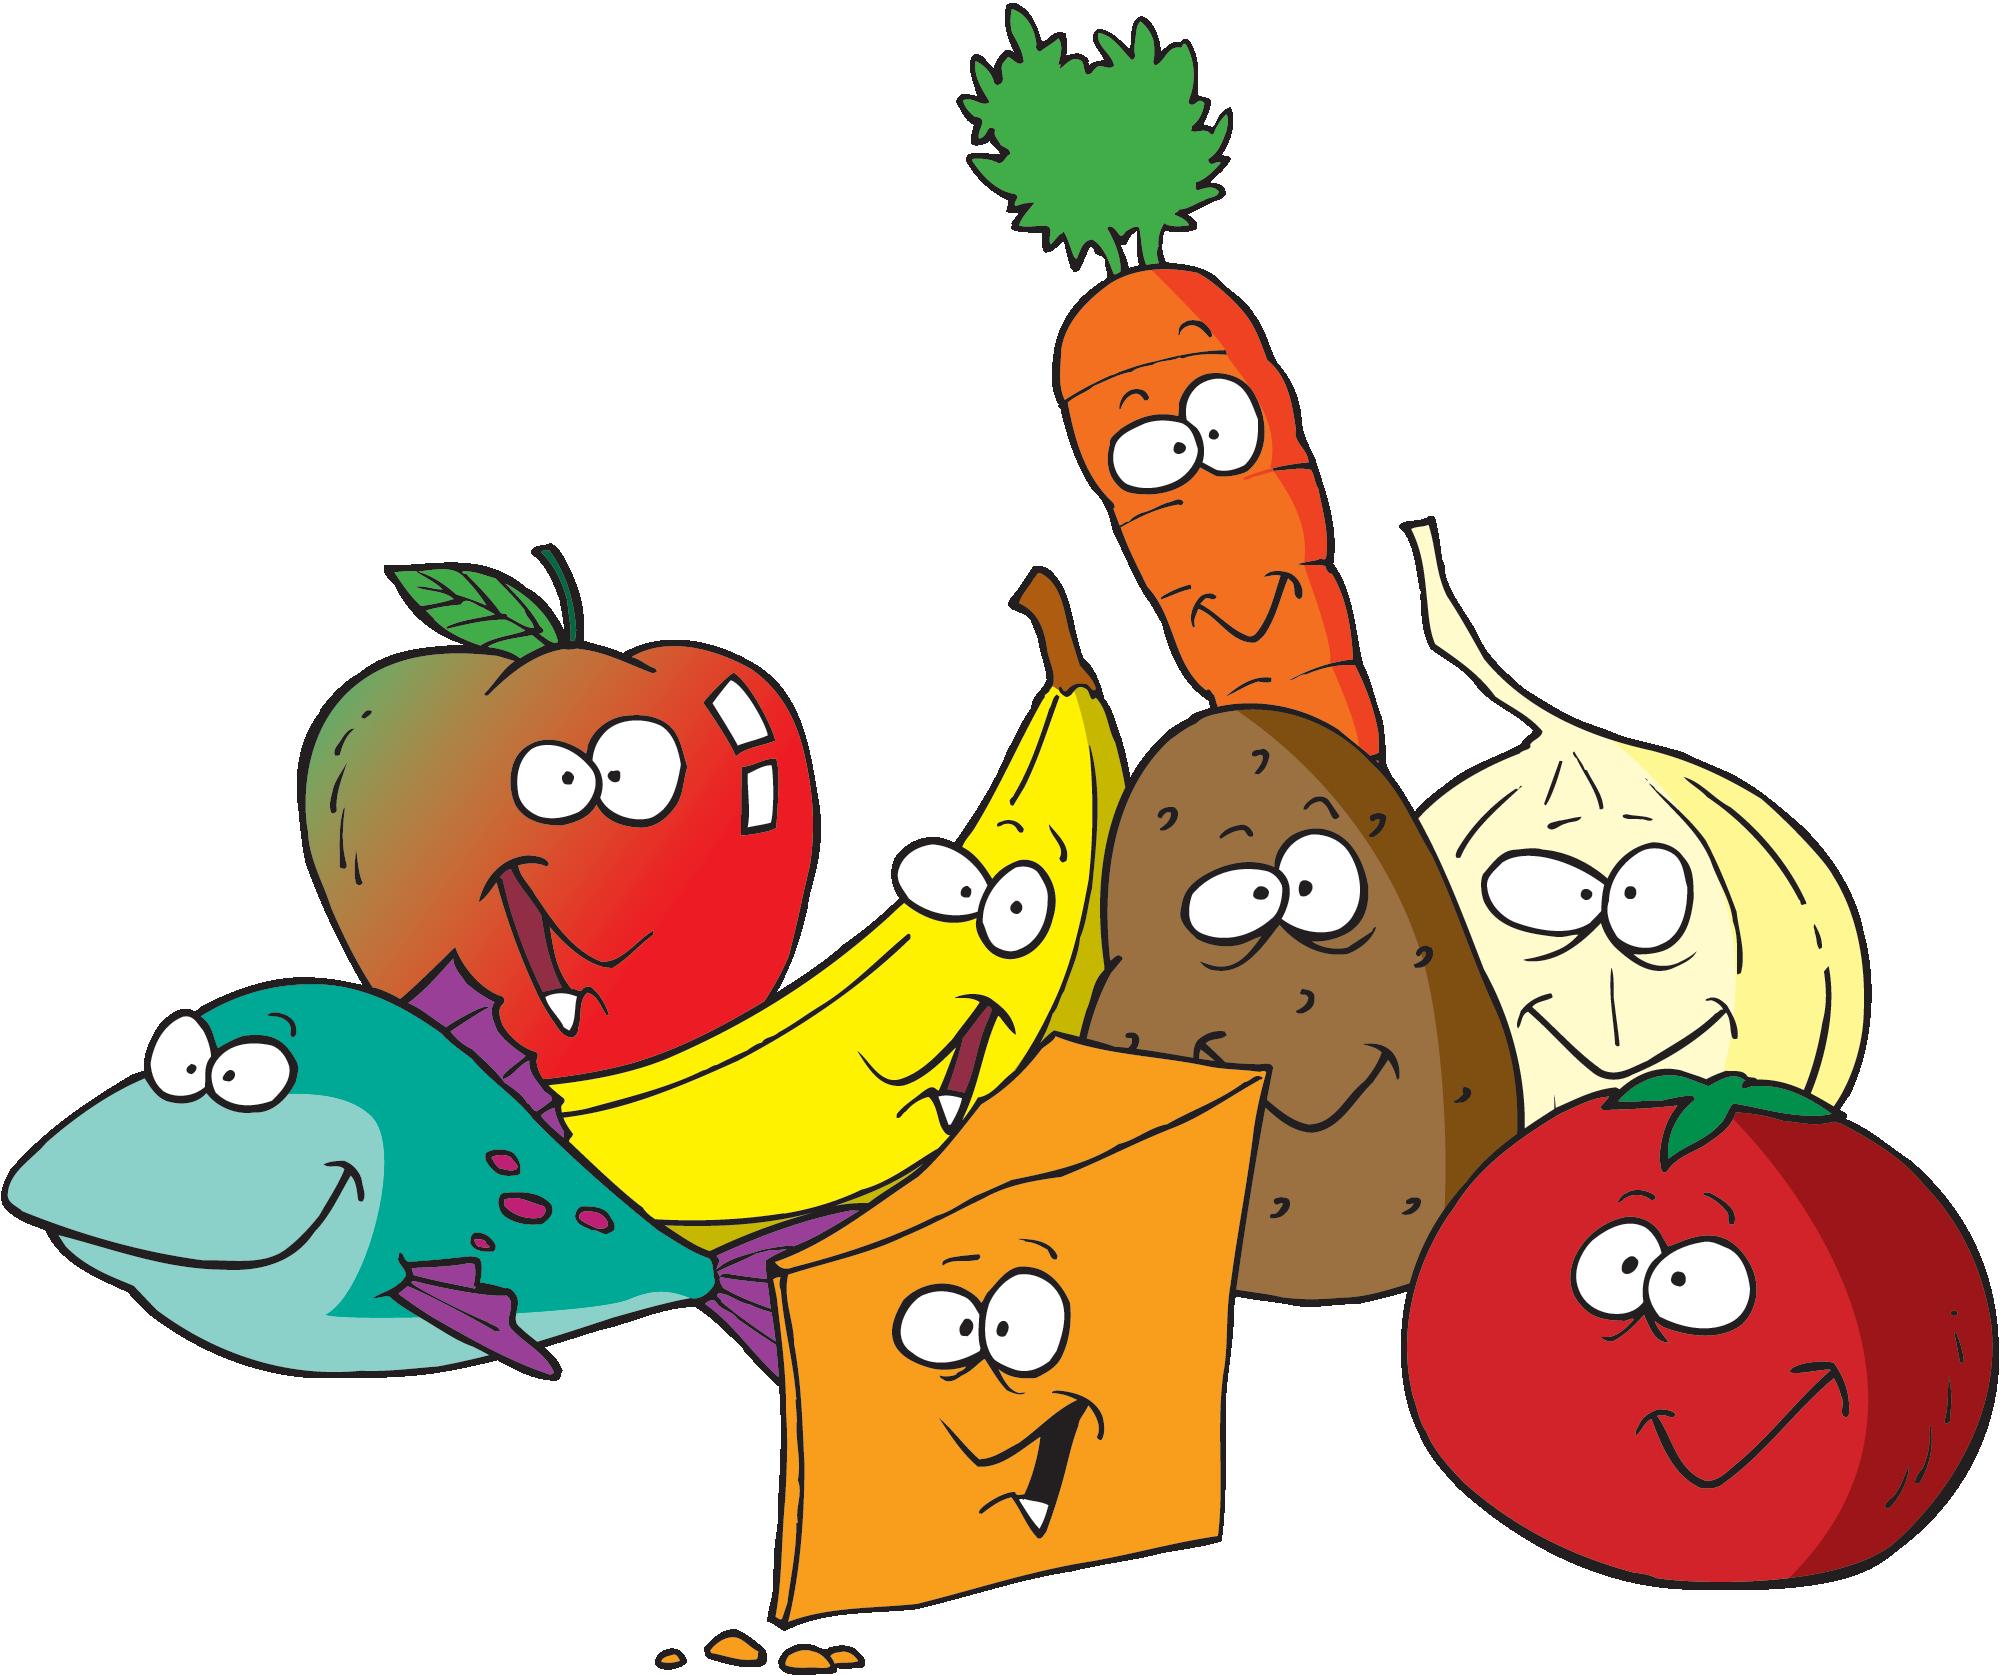 Snacks Cartoon | Free download best Snacks Cartoon on